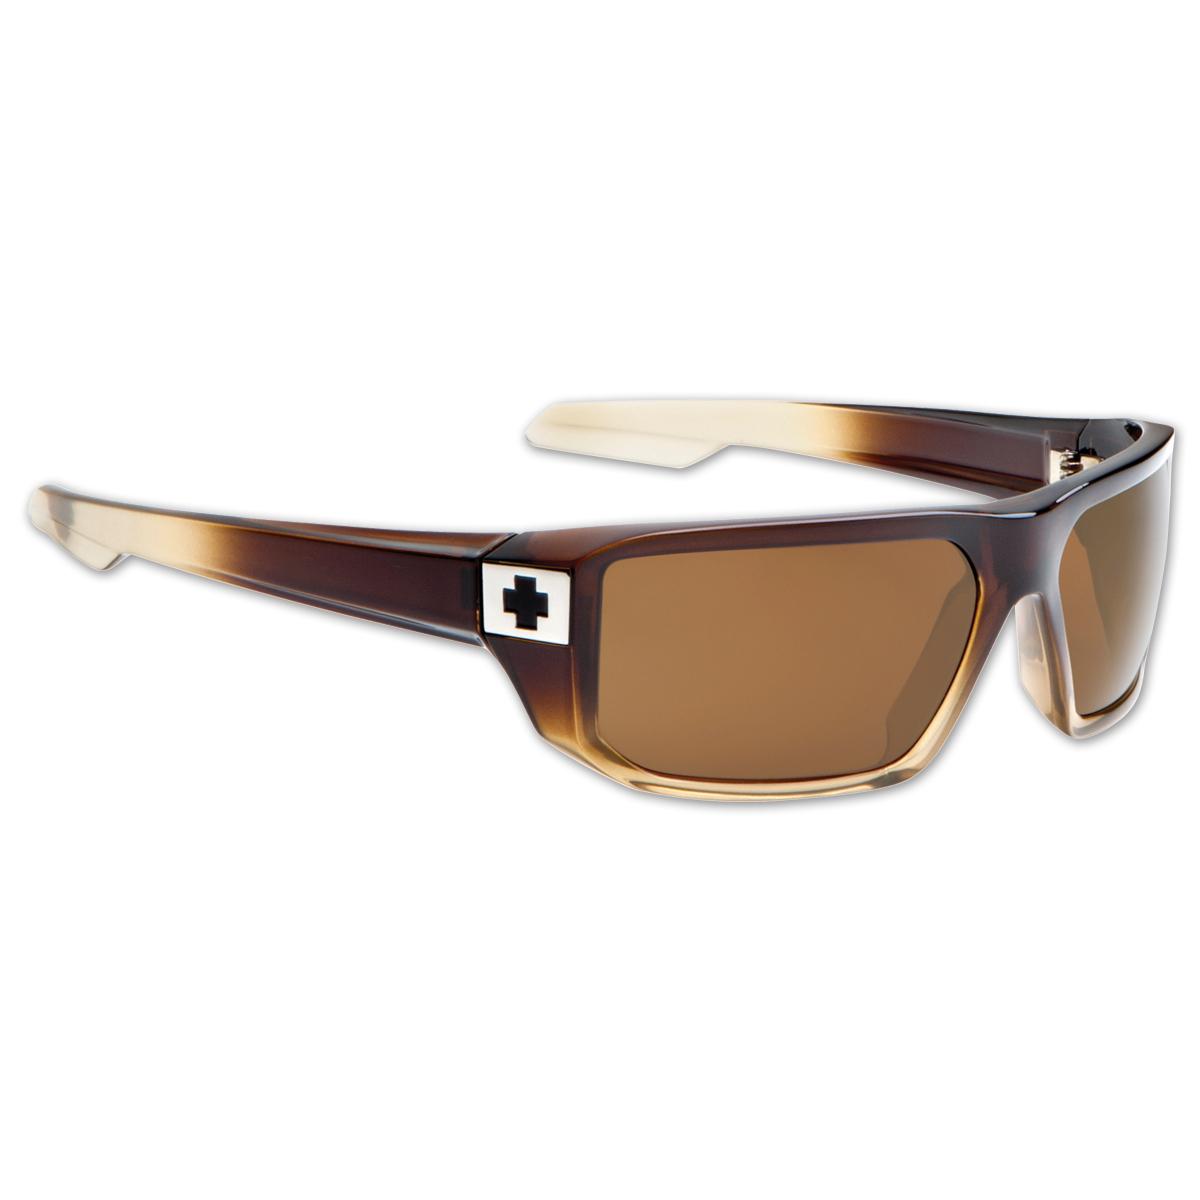 b3862c10e0 Spy Optic Nolen Polarized Sunglasses